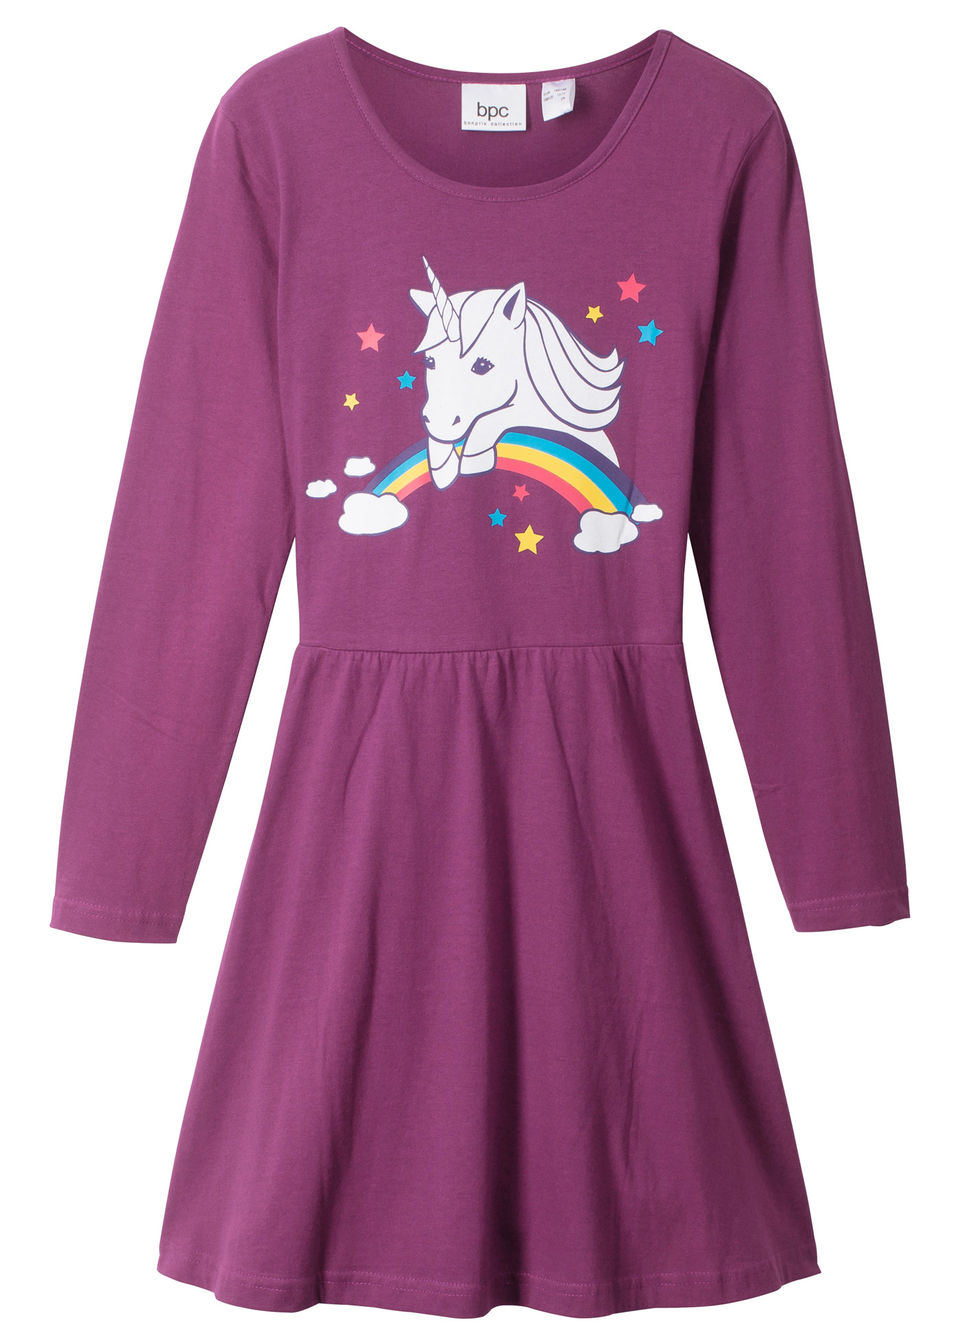 2159287318c8 Bonprix Dievčenské šaty s dlhým rukávom - Glami.sk